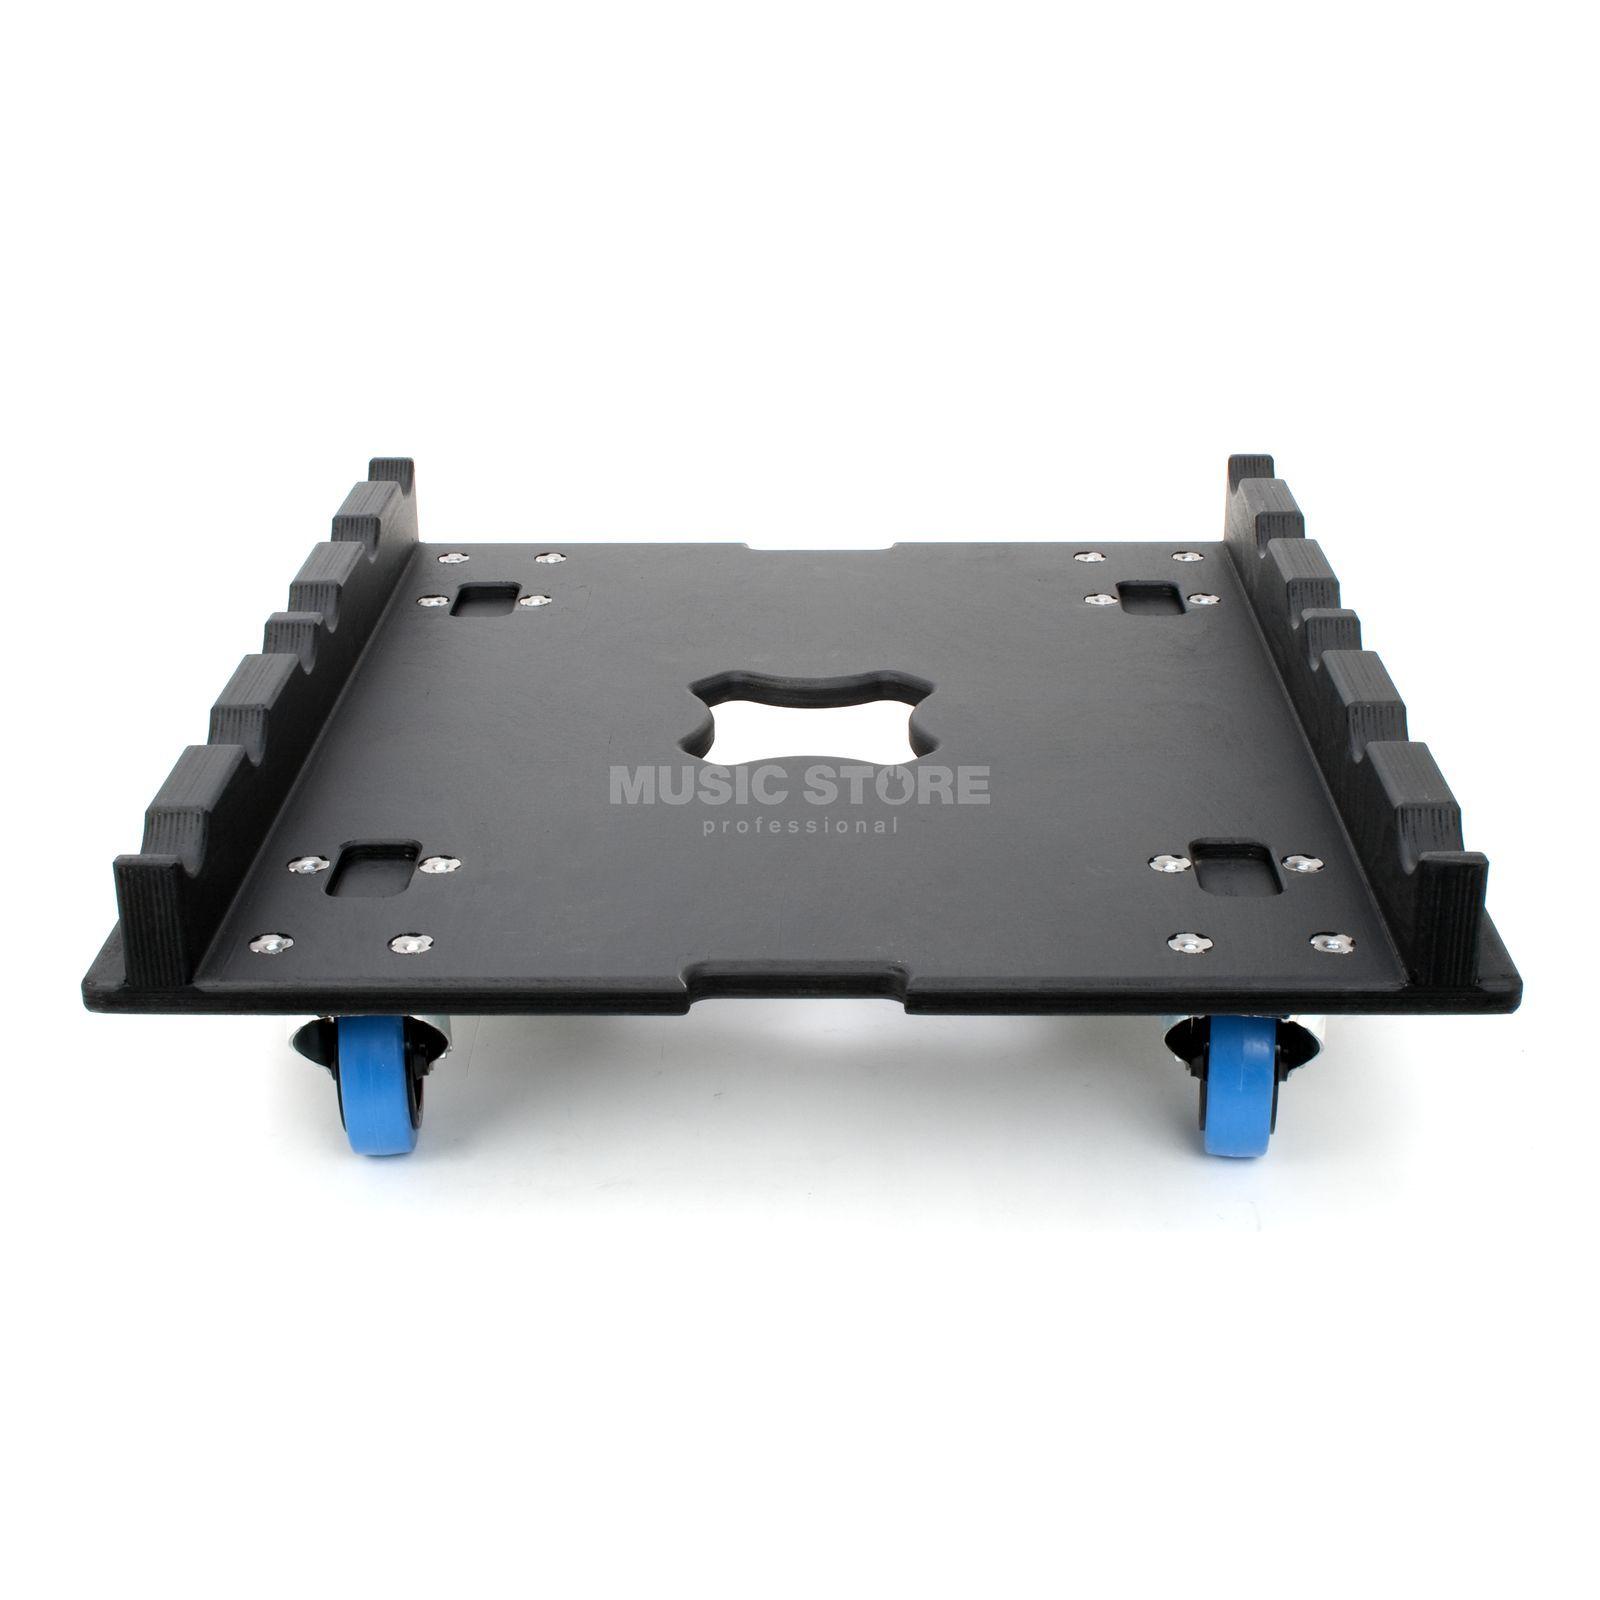 truss rollbrett 600 x 600 100mm rollen,blau,18mm mp-holz